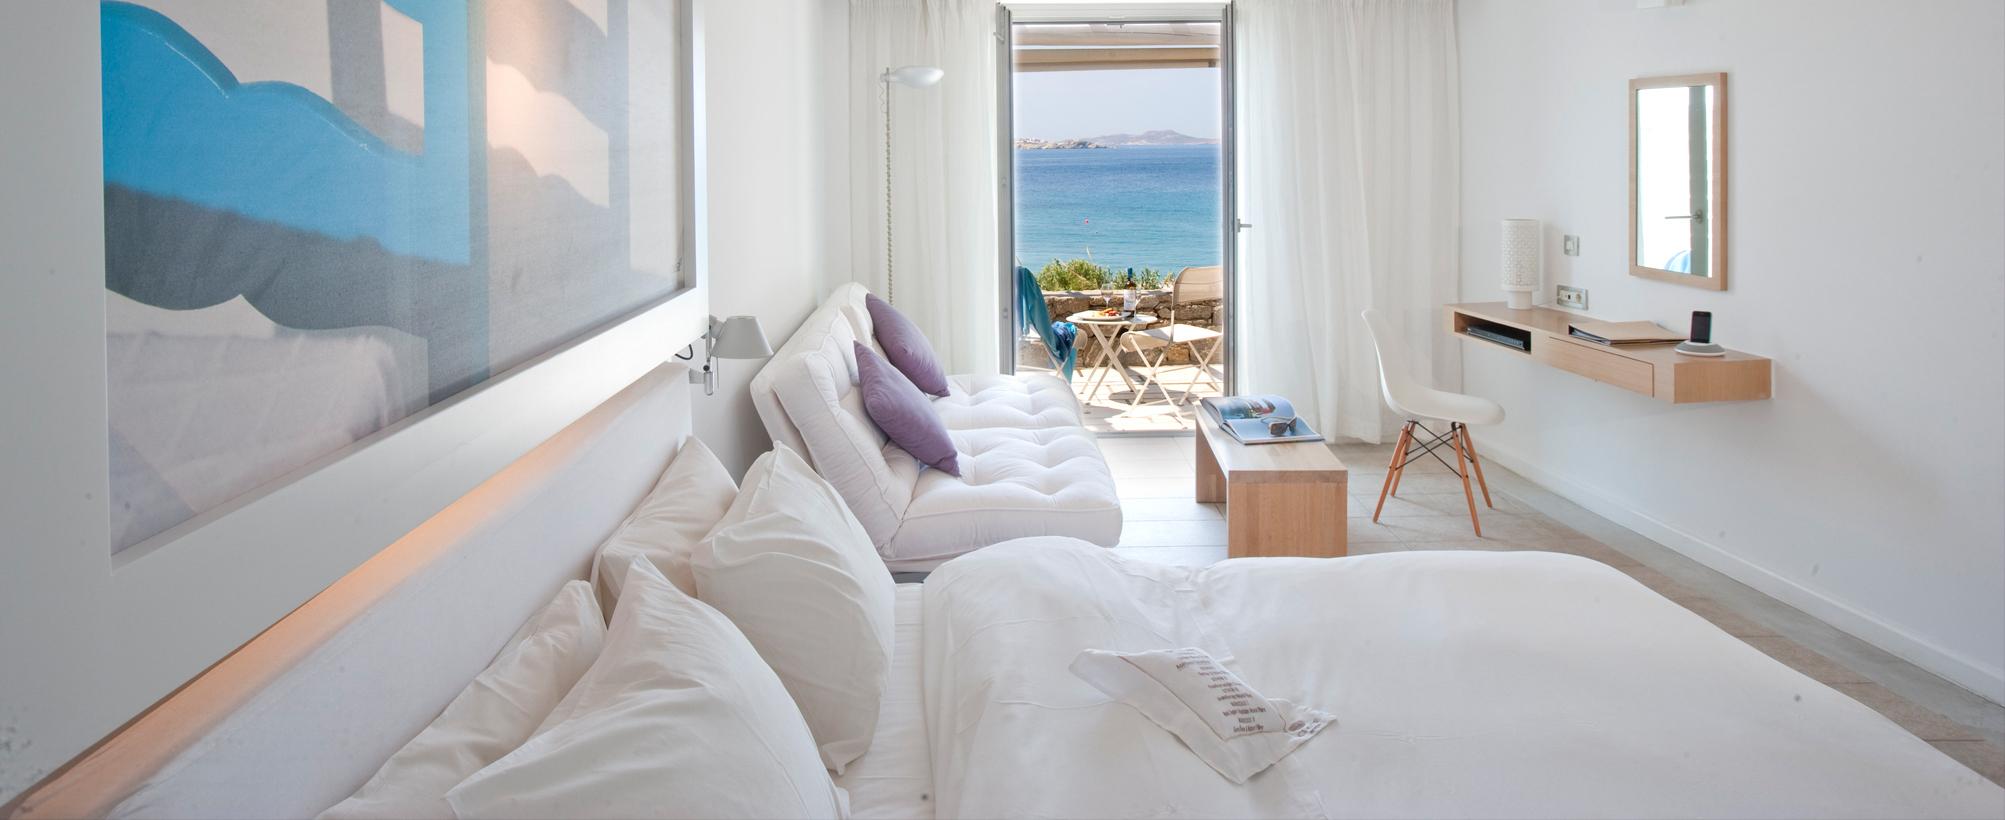 junior-suite-grace-mykonos